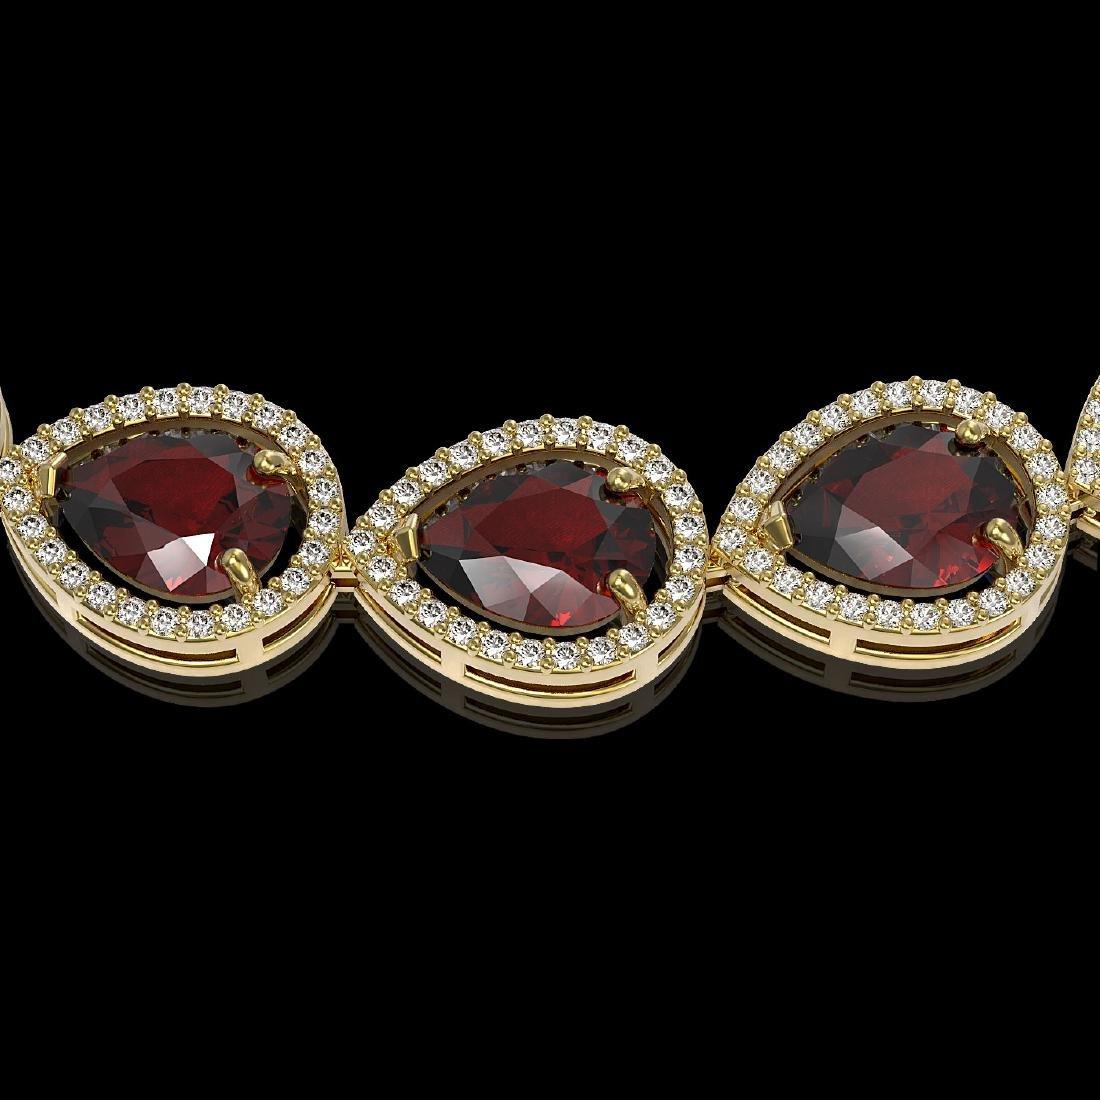 36.8 CTW Garnet & Diamond Halo Necklace 10K Yellow Gold - 3